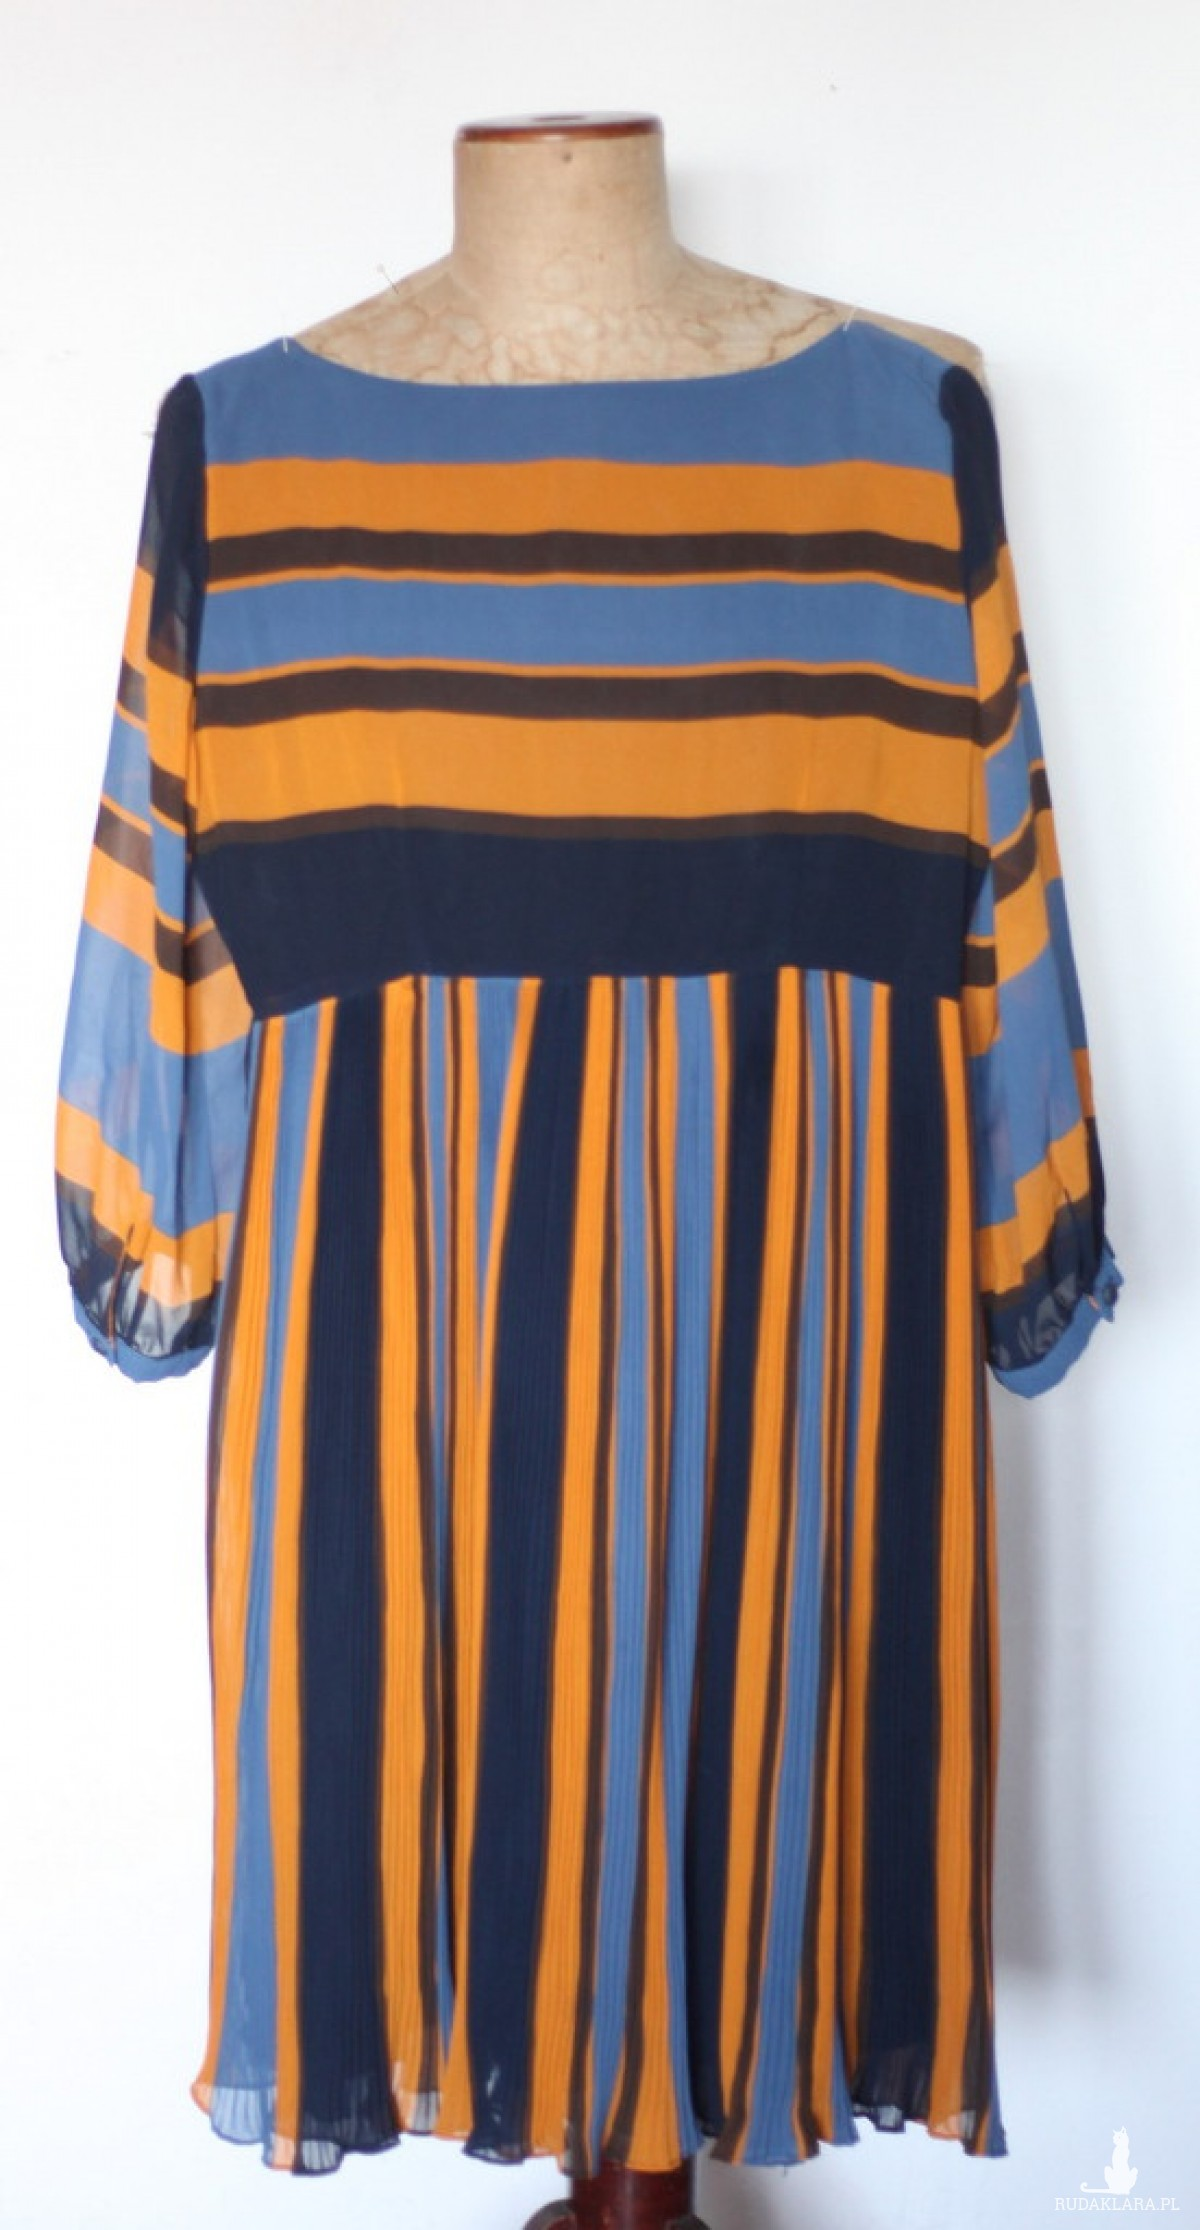 damska sukienka plisowana w paski D1